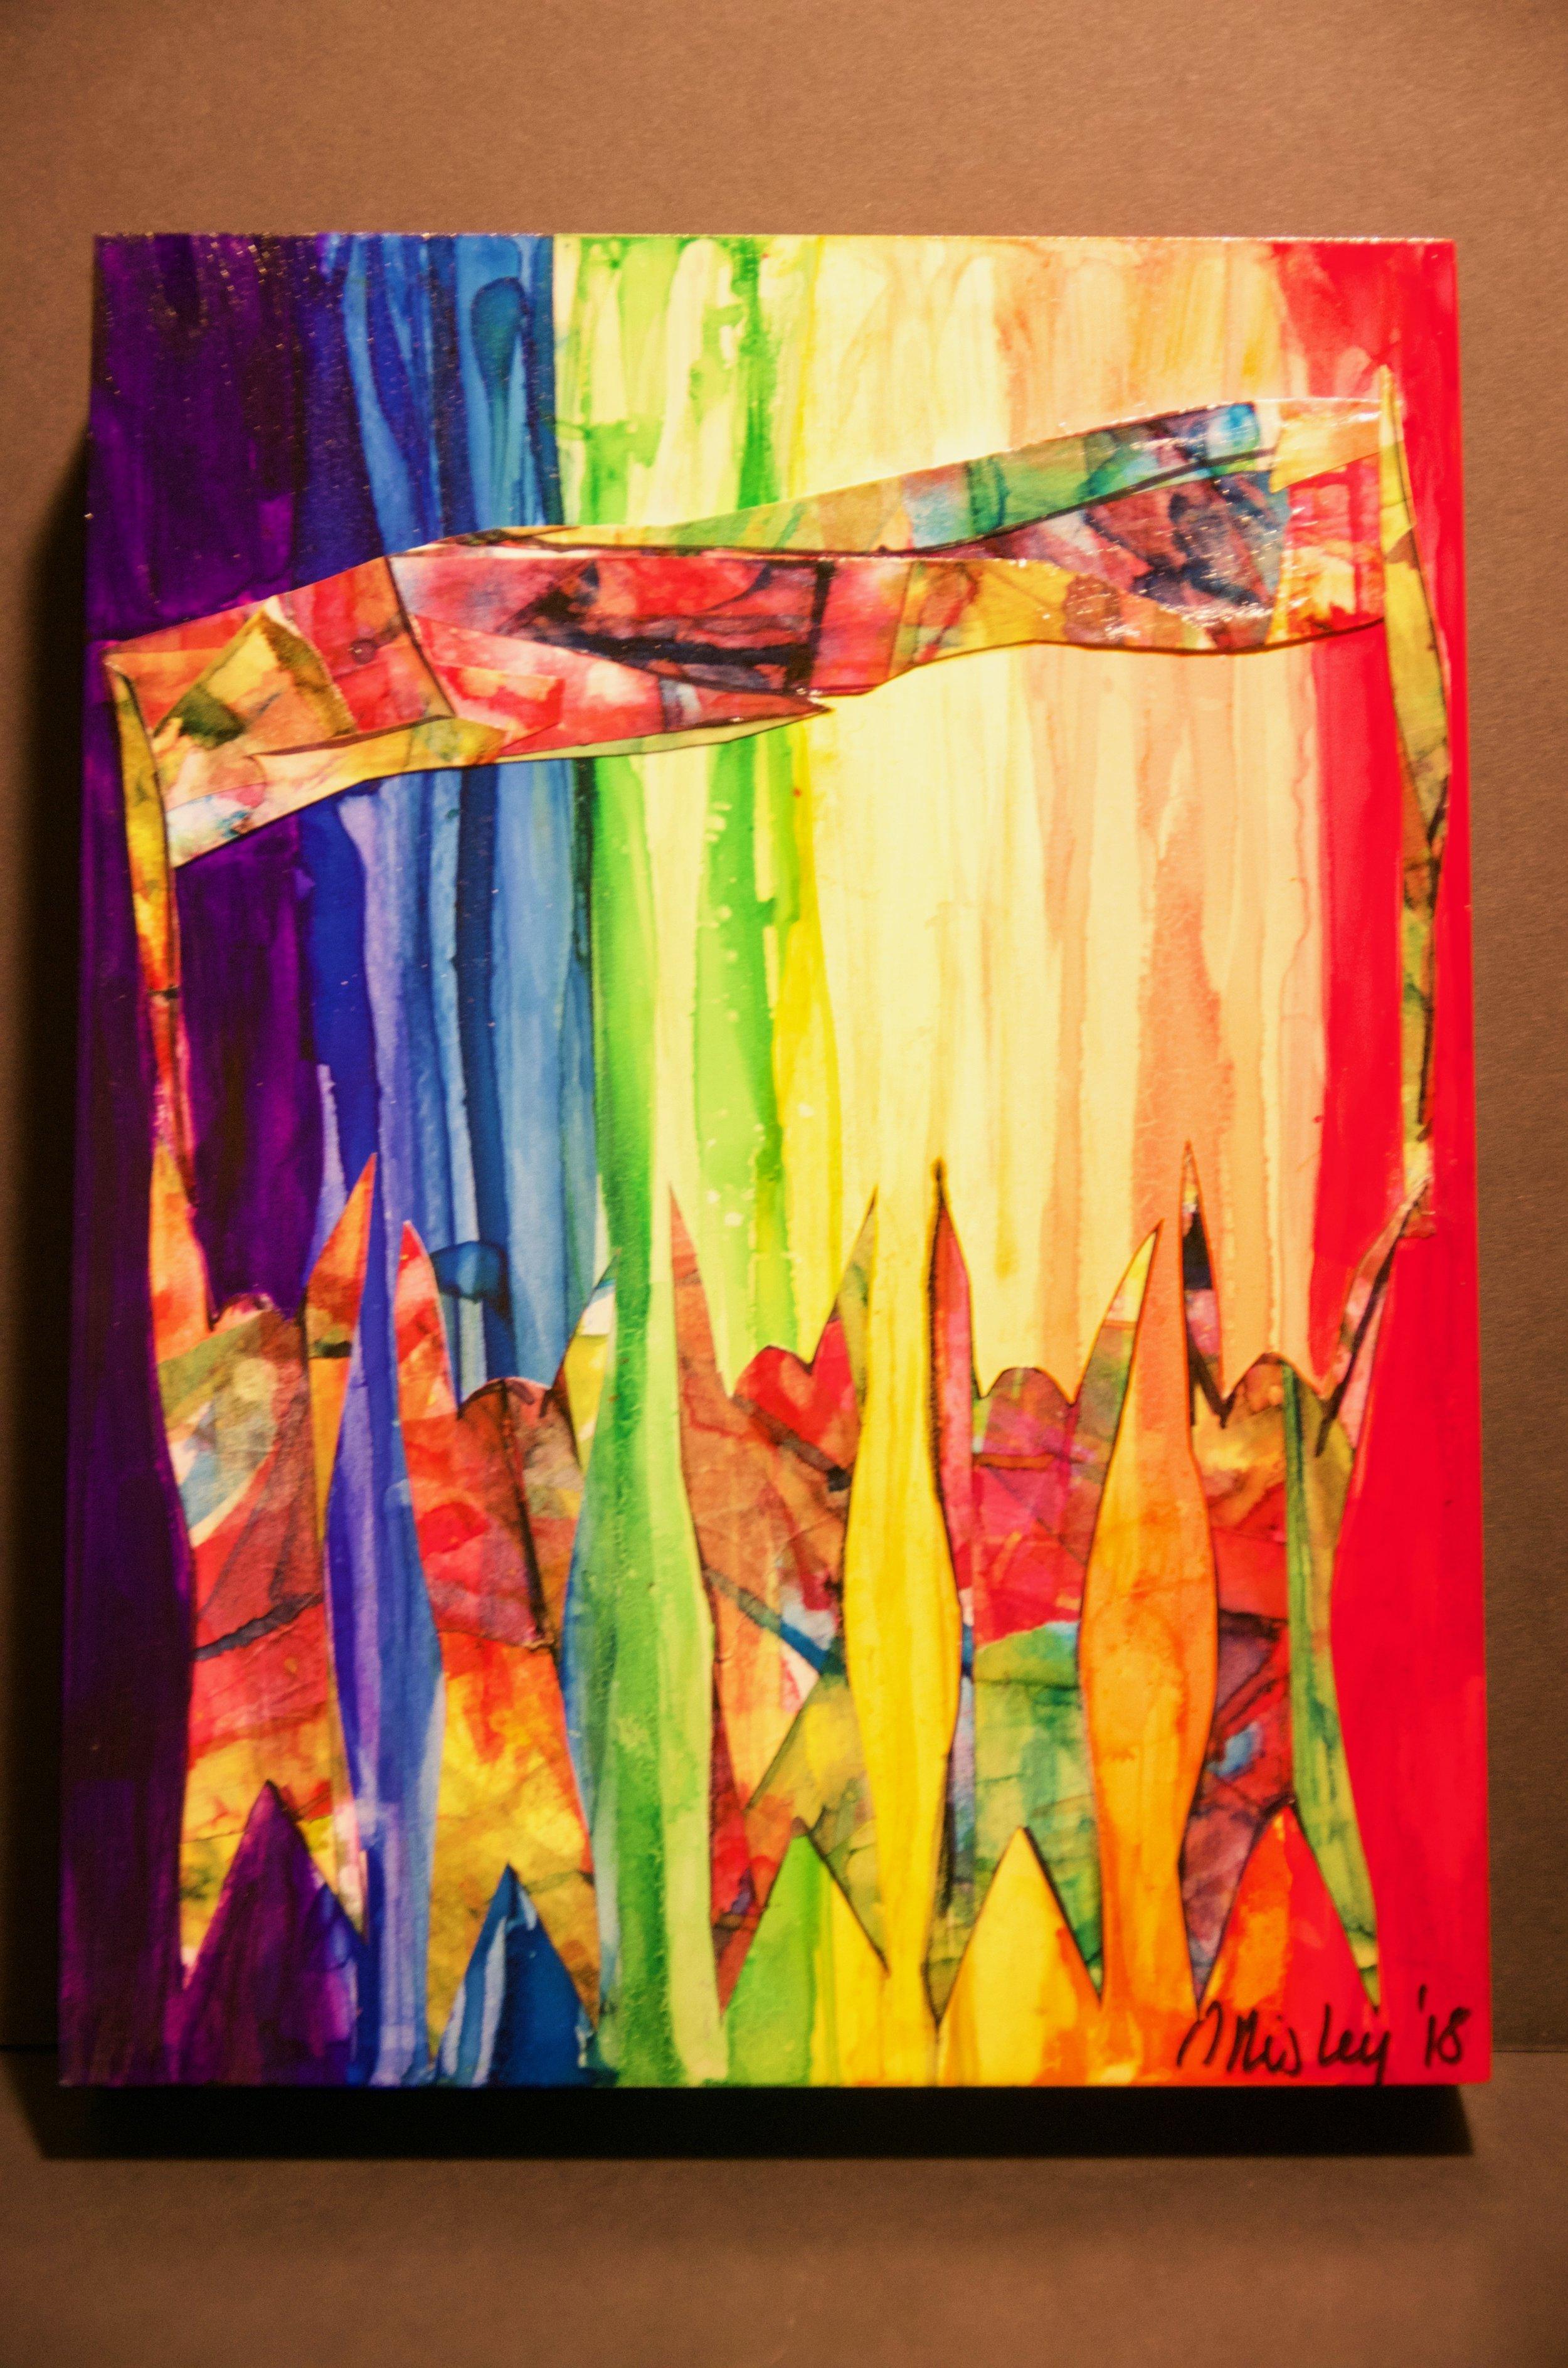 "SARA RISLEY   Alcohol ink and artist's tape on cradled panel | 9""x12"" (unframed)   Value:  $250 |  Minimum bid:  $100"